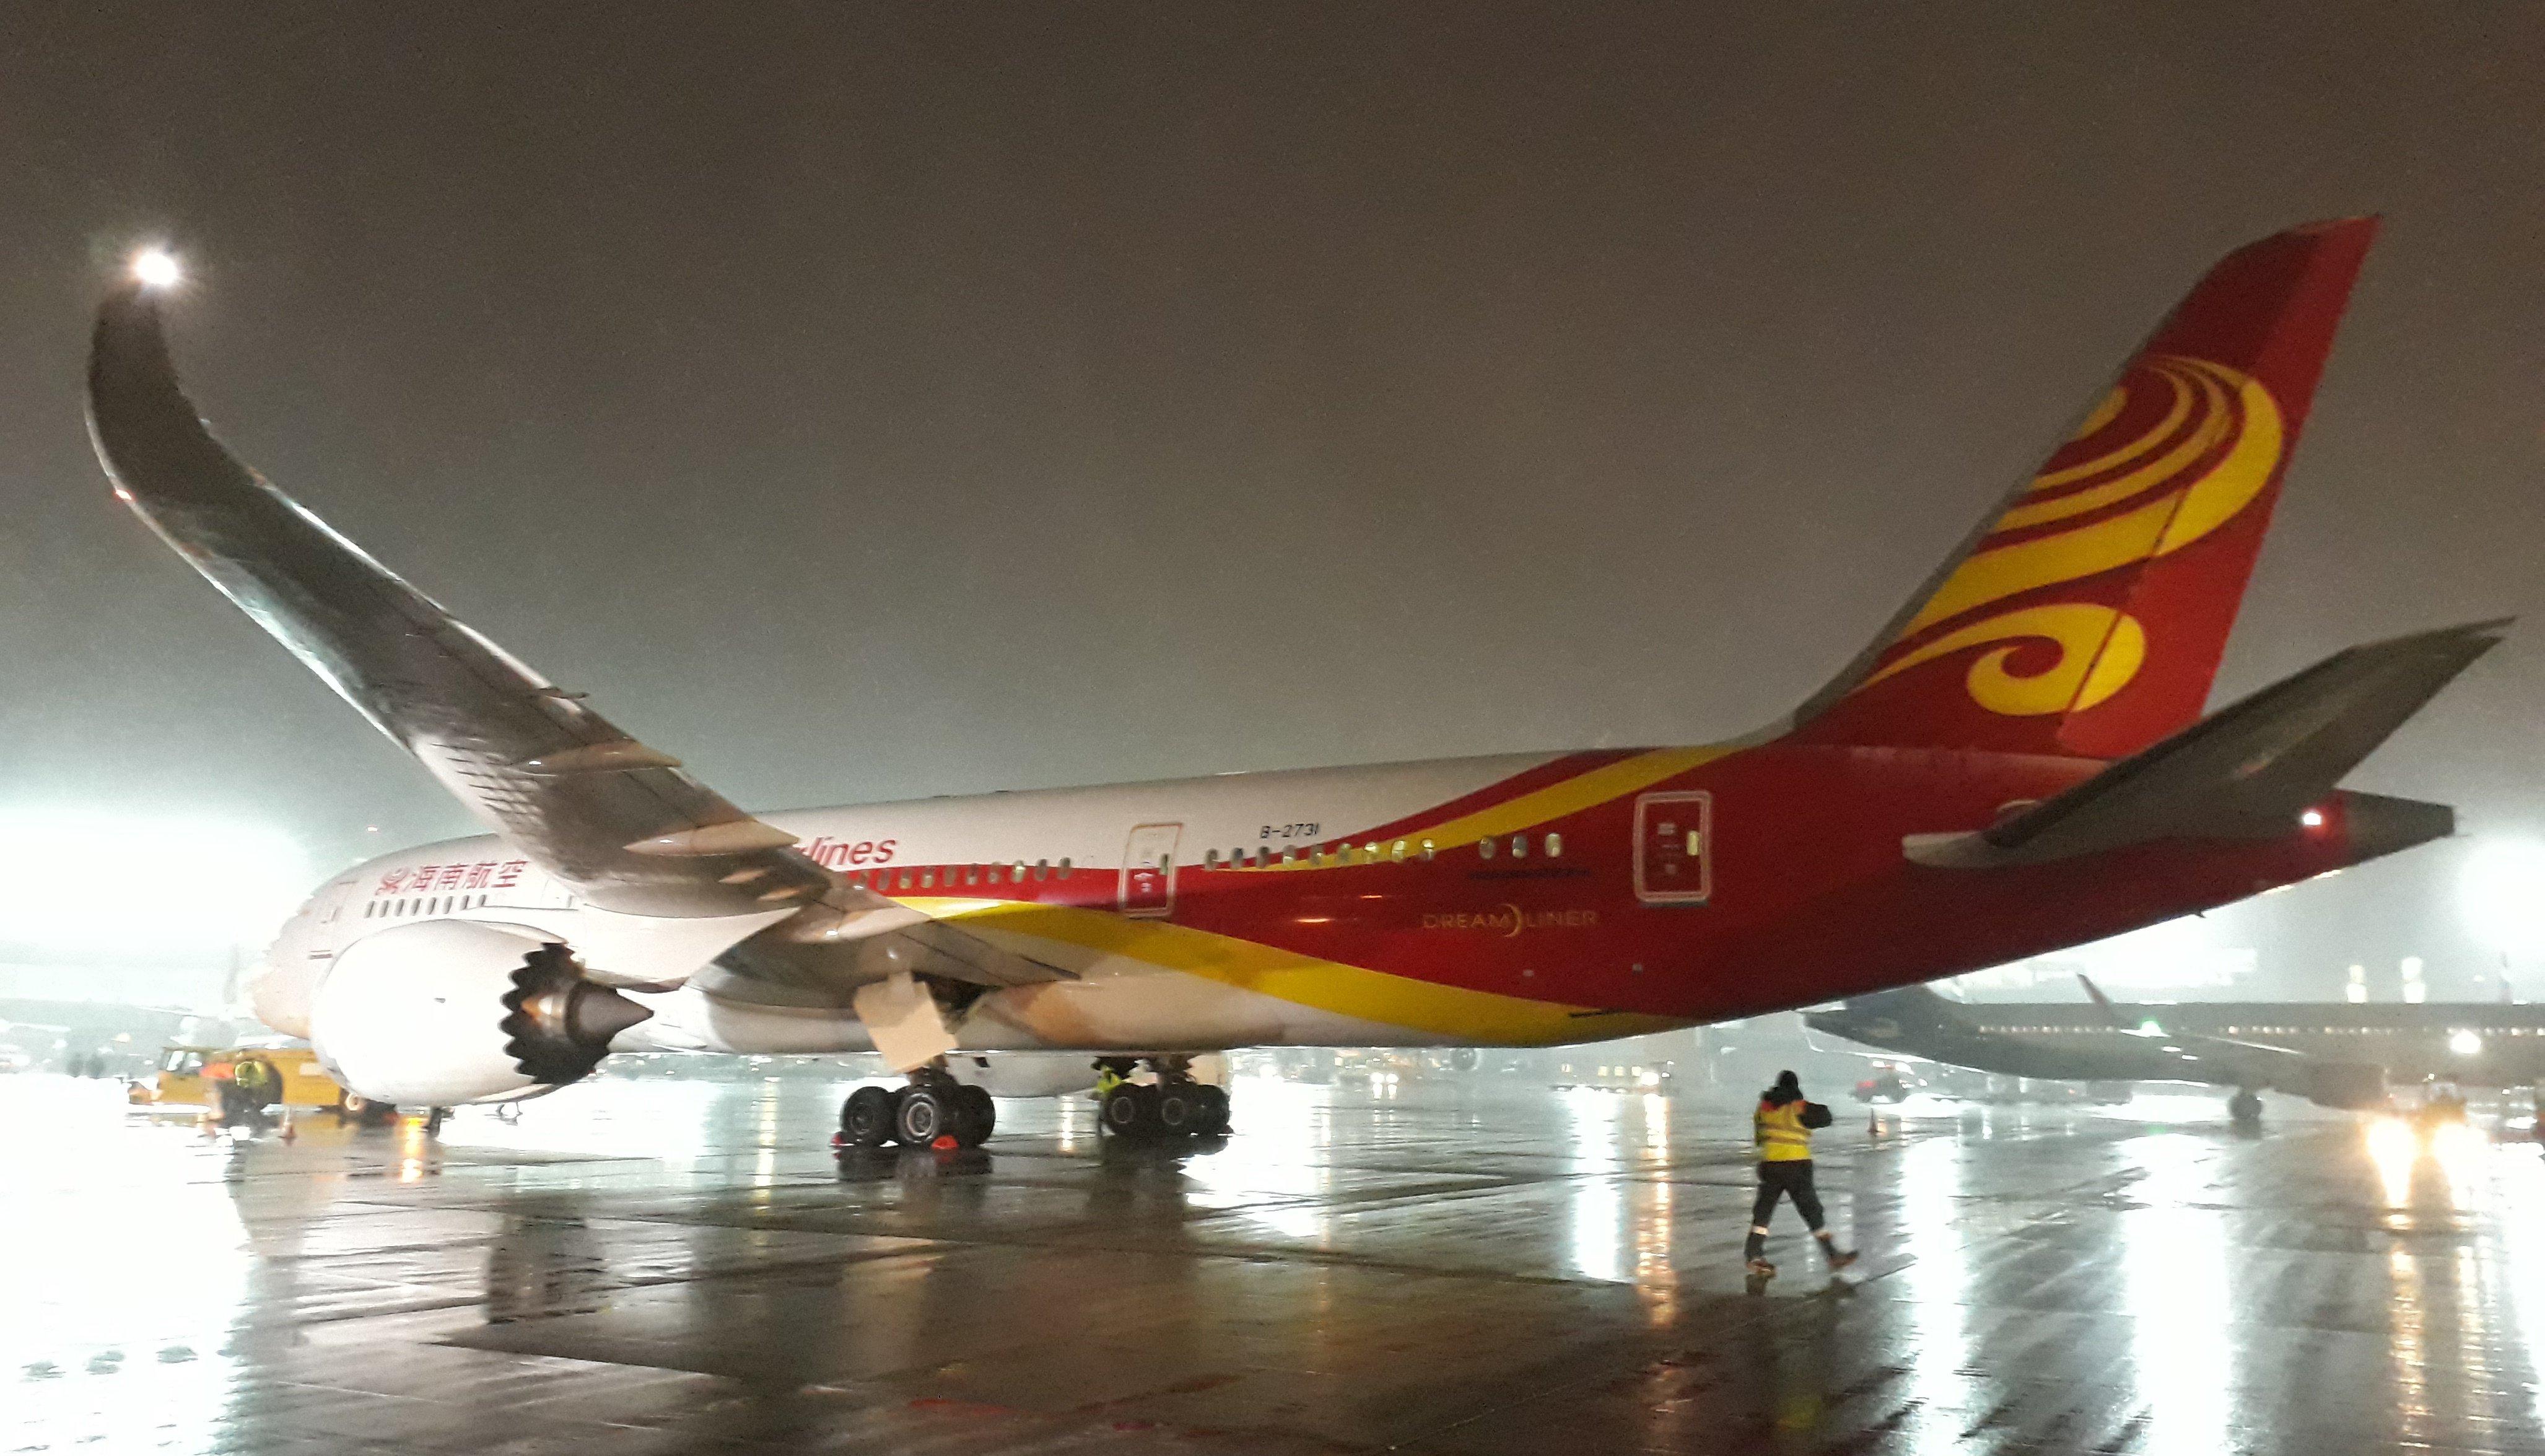 Hainan Airlines стала летать в Москву и Петербург на Boeing 787 Dreamliner